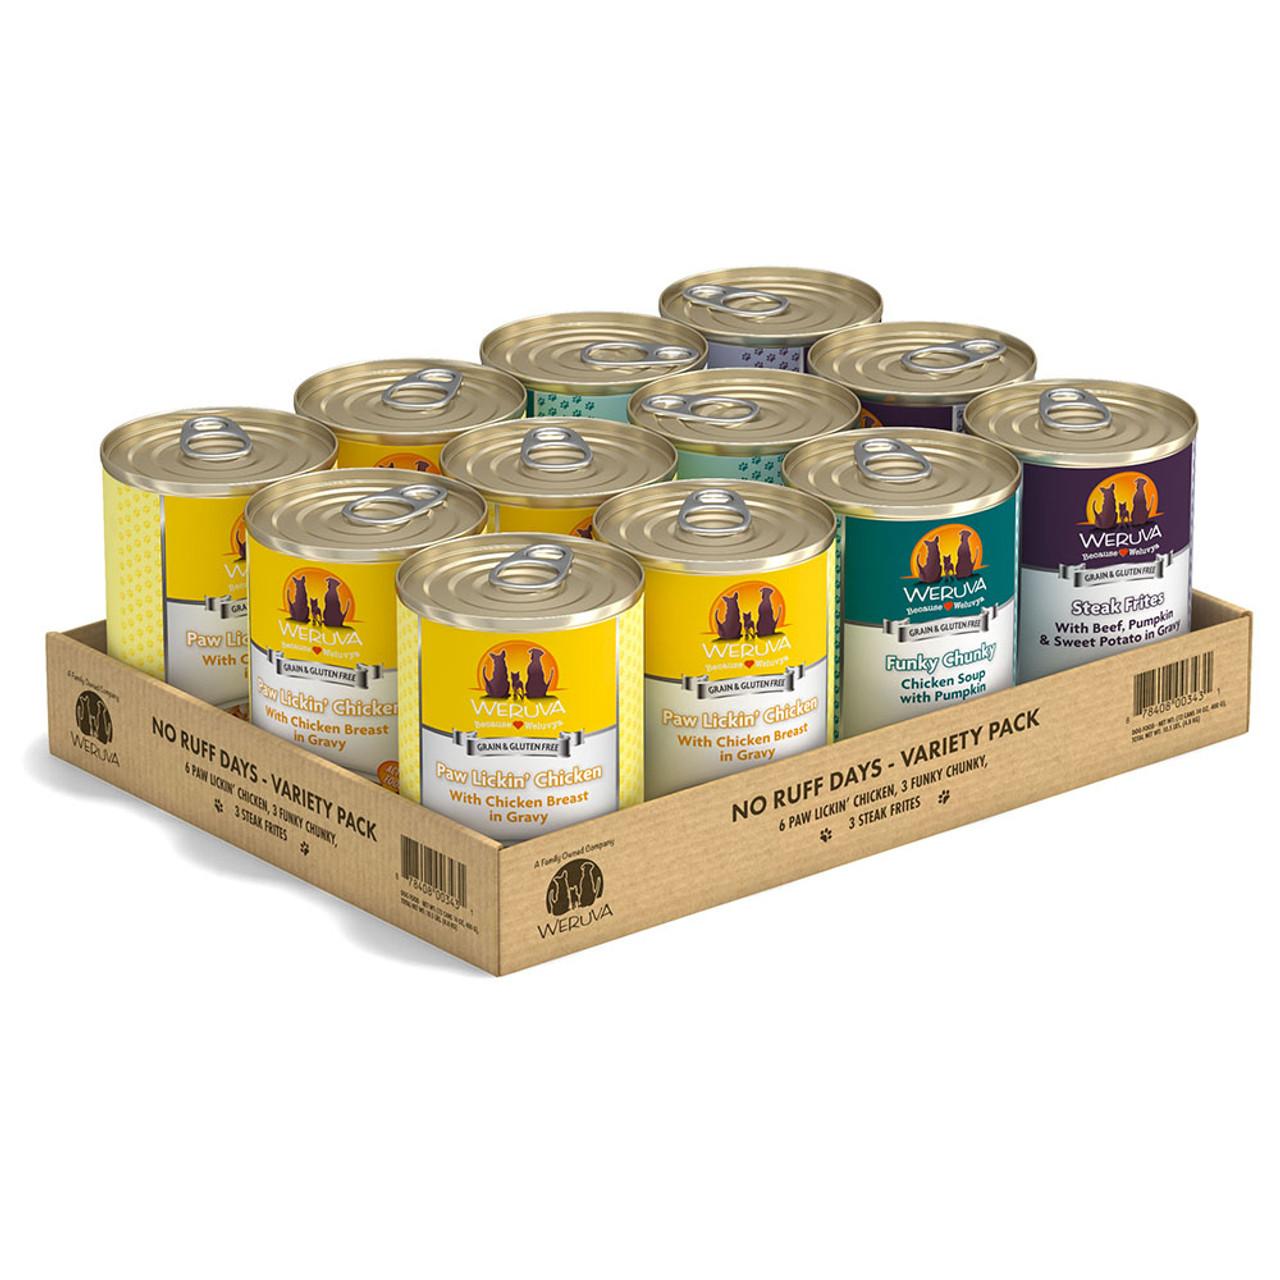 Weruva No Ruff Days Variety Pack Canned Dog Food